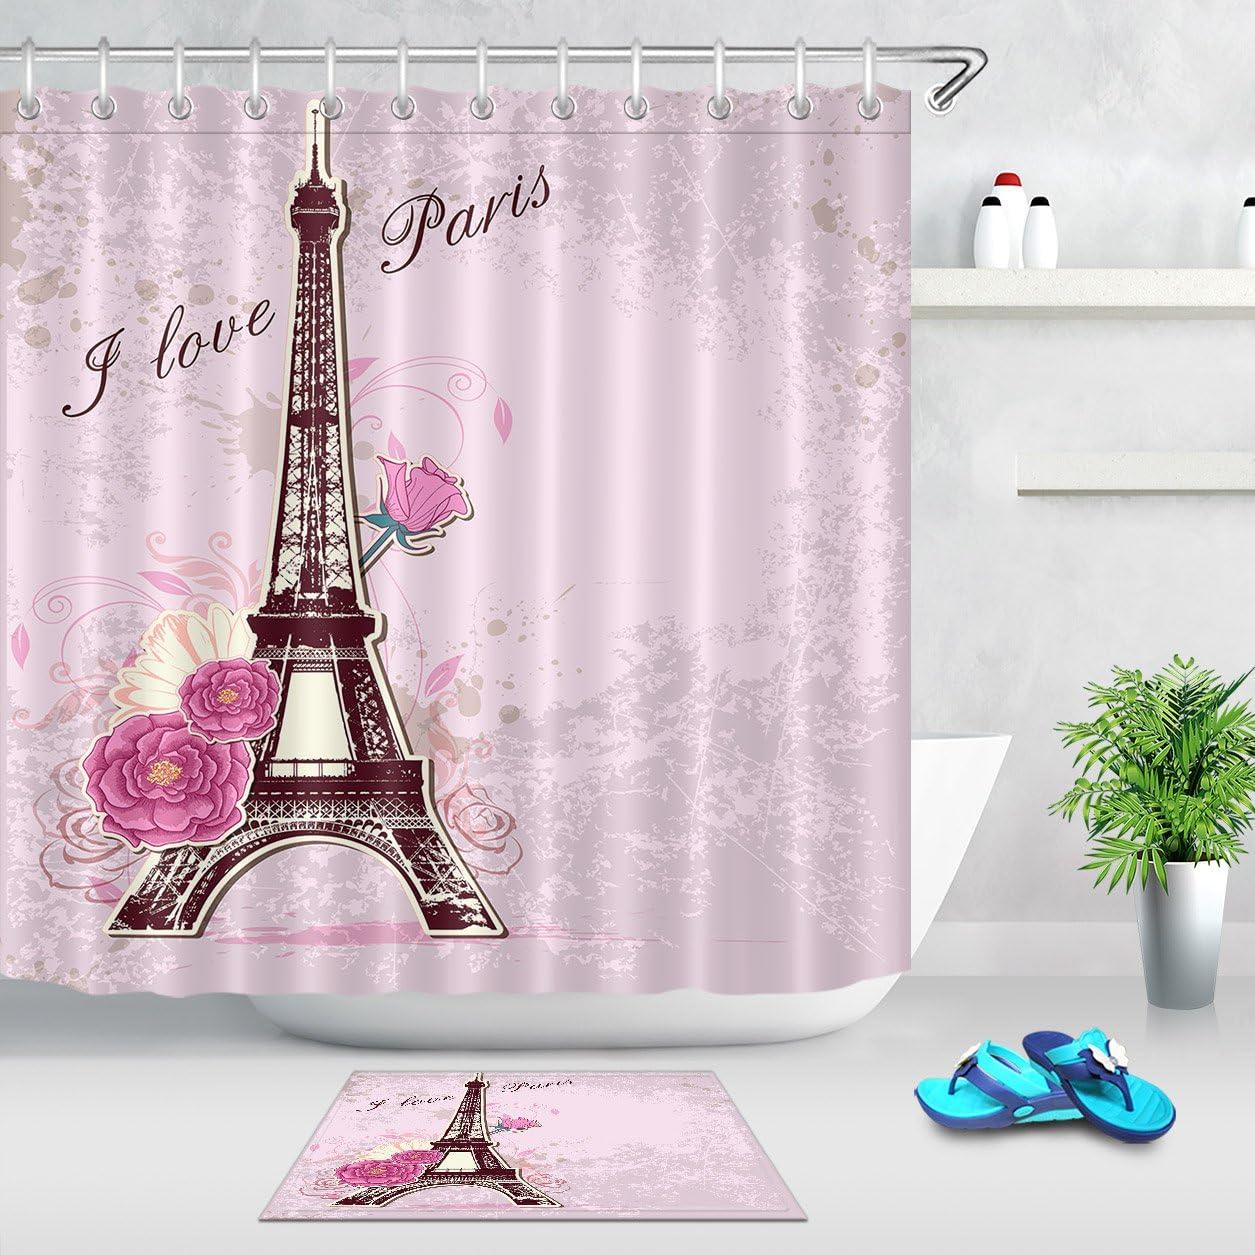 Eiffel Tower Circle Wood Board Shower Curtain Bathroom Tub Set Waterproof Fabric